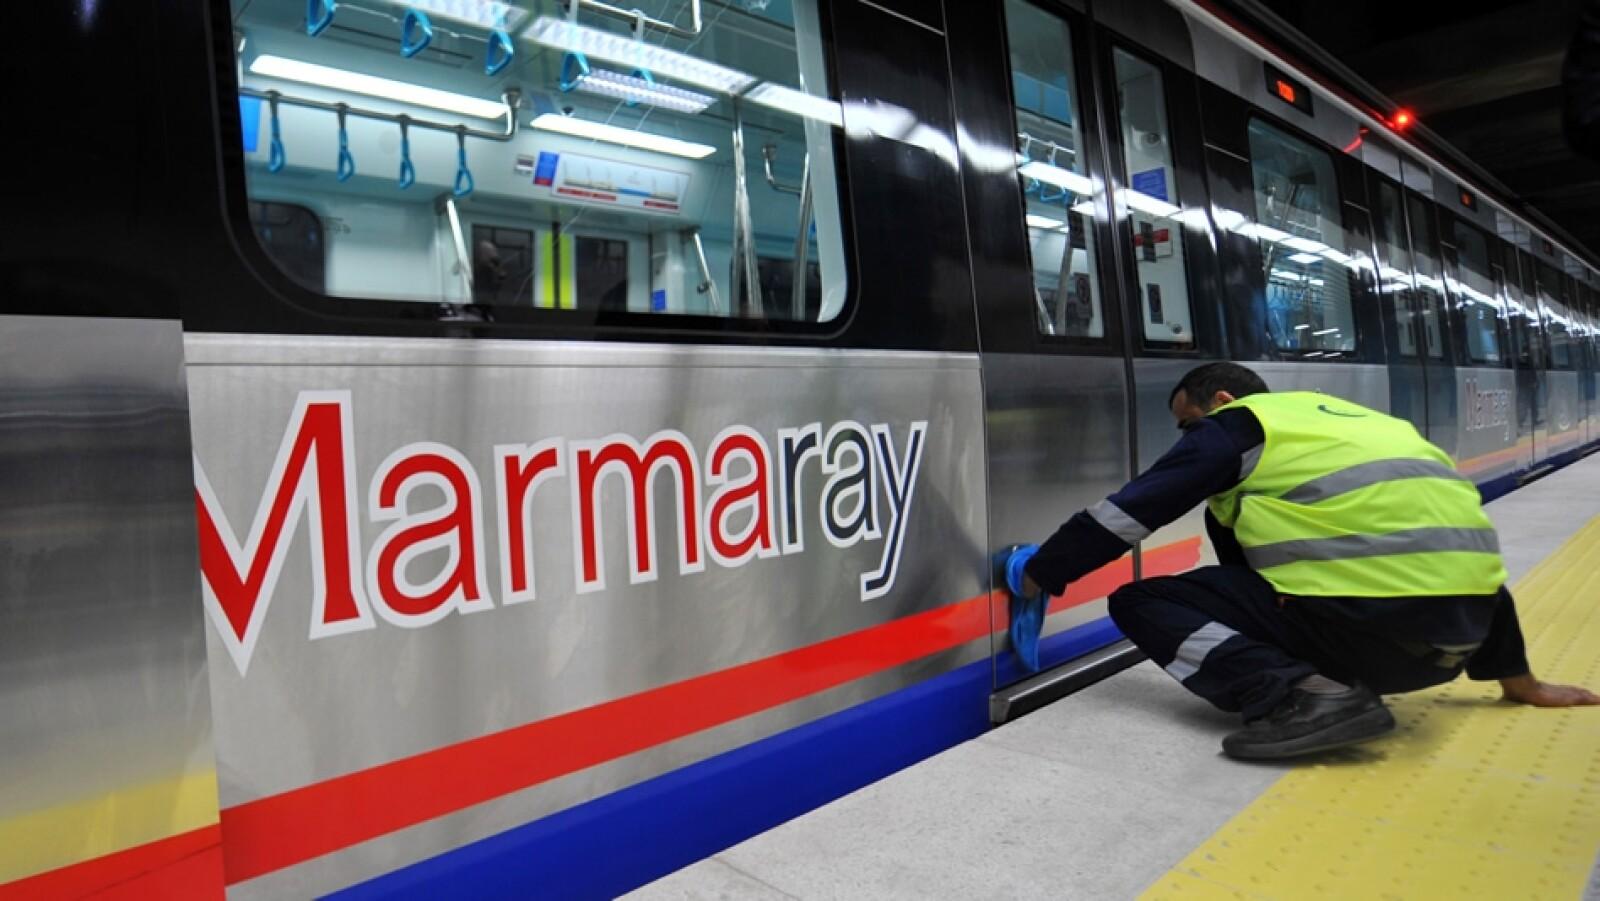 Marmaray tren Turquía 11